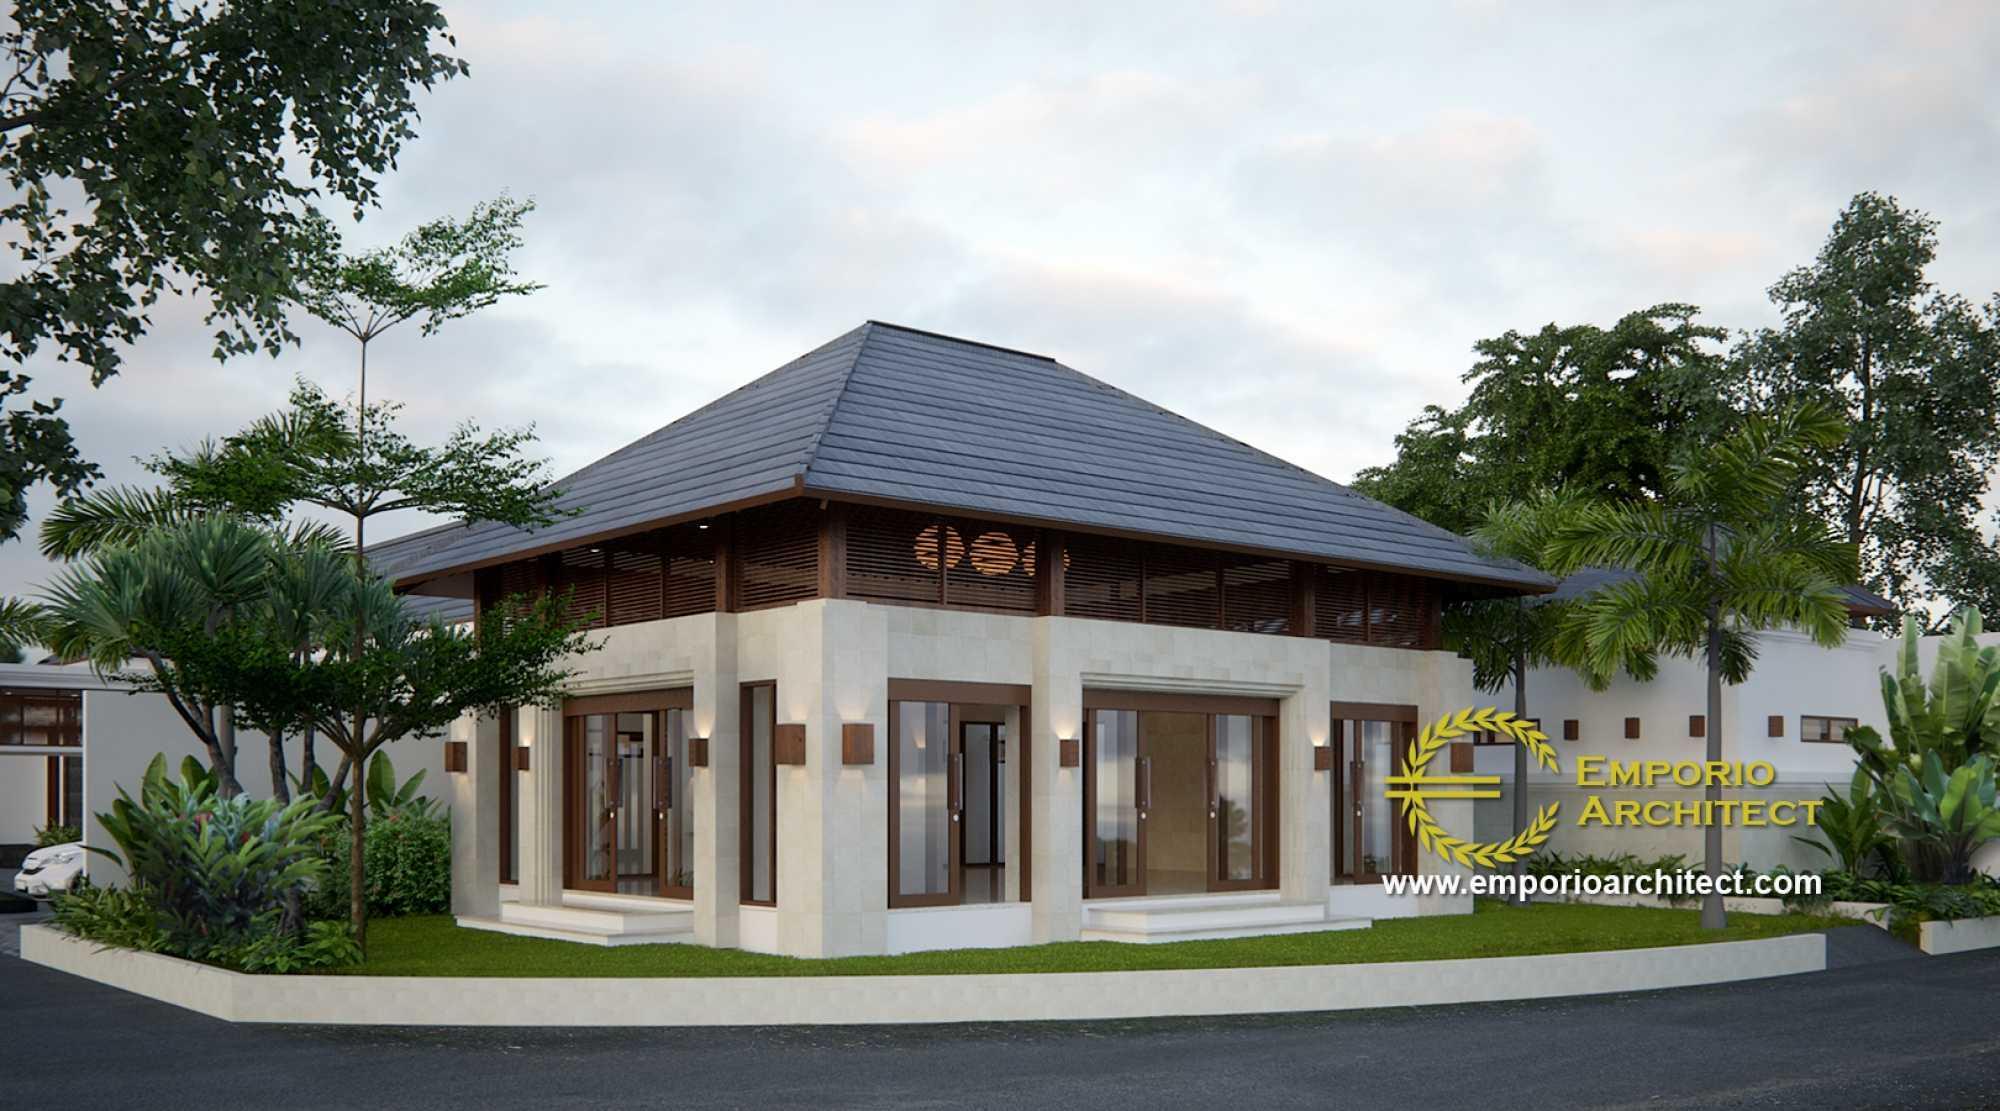 Emporio Architect Desain Rumah Villa Bali Tropis 334 @ Tasikmalaya, Jawa Barat Tasikmalaya, Jawa Barat, Indonesia Tasikmalaya, Jawa Barat, Indonesia Emporio-Architect-Desain-Rumah-Villa-Bali-Tropis-334-Tasikmalaya-Jawa-Barat Tropical 74977